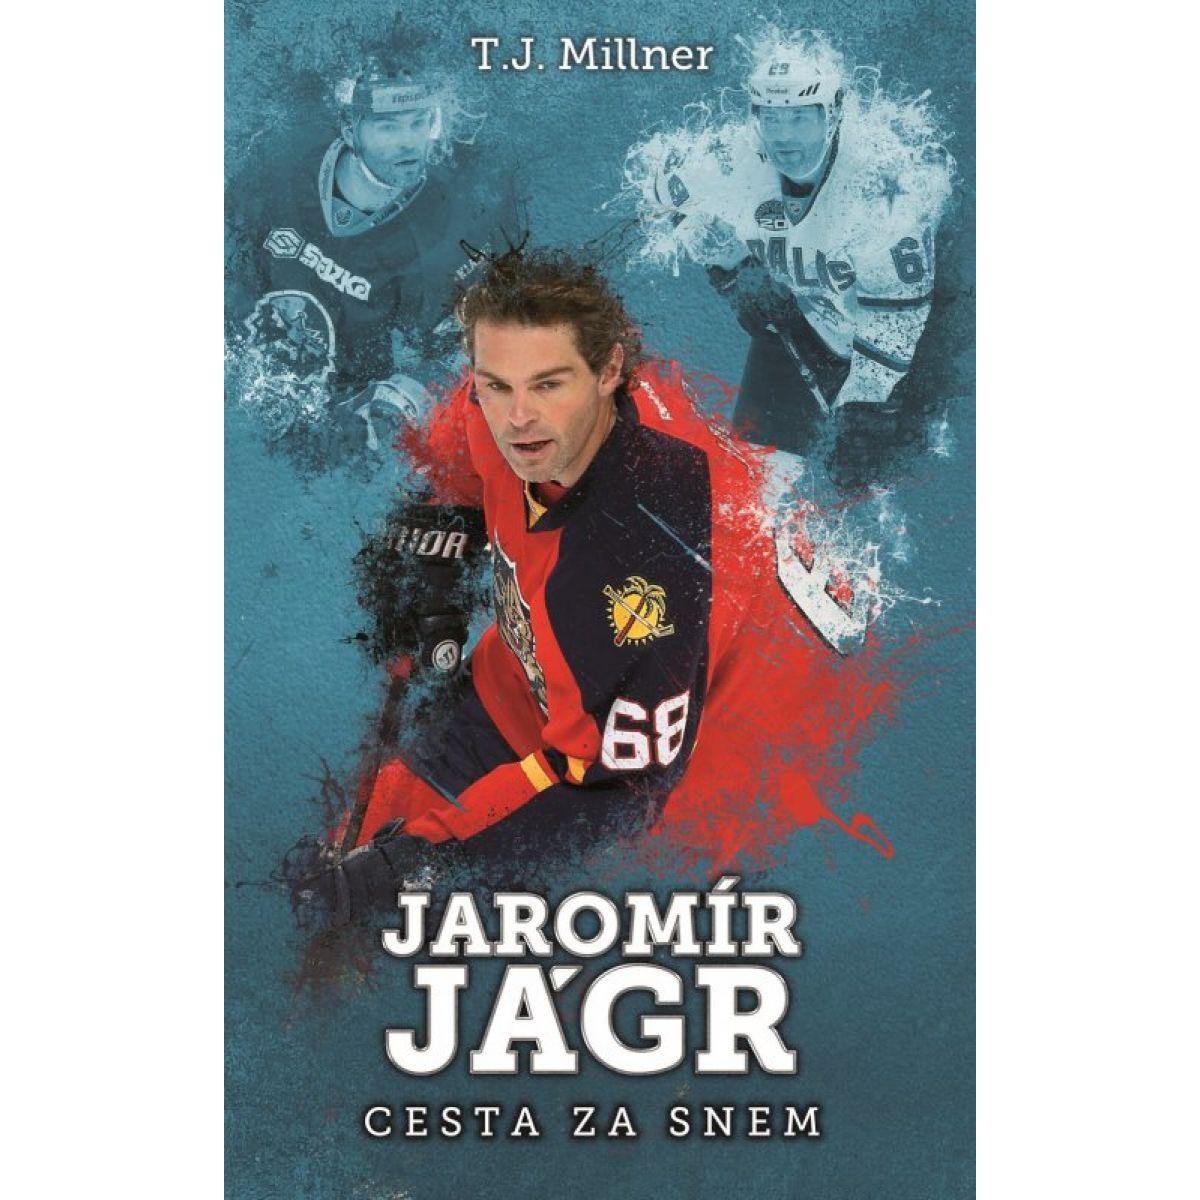 Jaromír Jágr: cesta za snom - TJ Millner